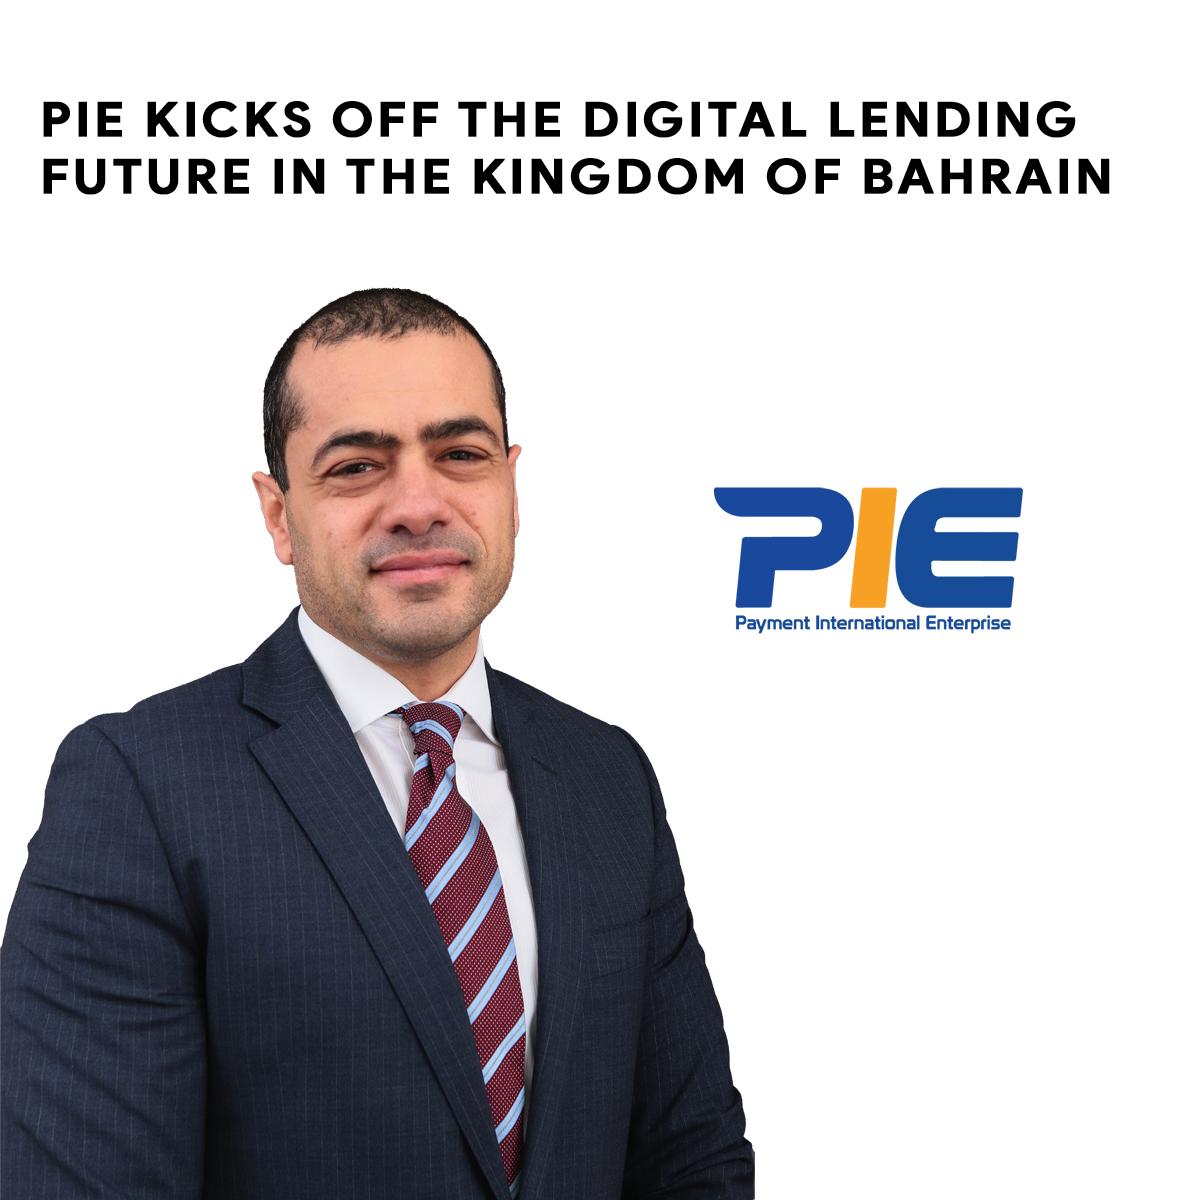 PAYMENT INTERNATIONAL ENTERPRISE KICKS OFF THE DIGITAL LENDING FUTURE IN THE KINGDOM OF BAHRAIN